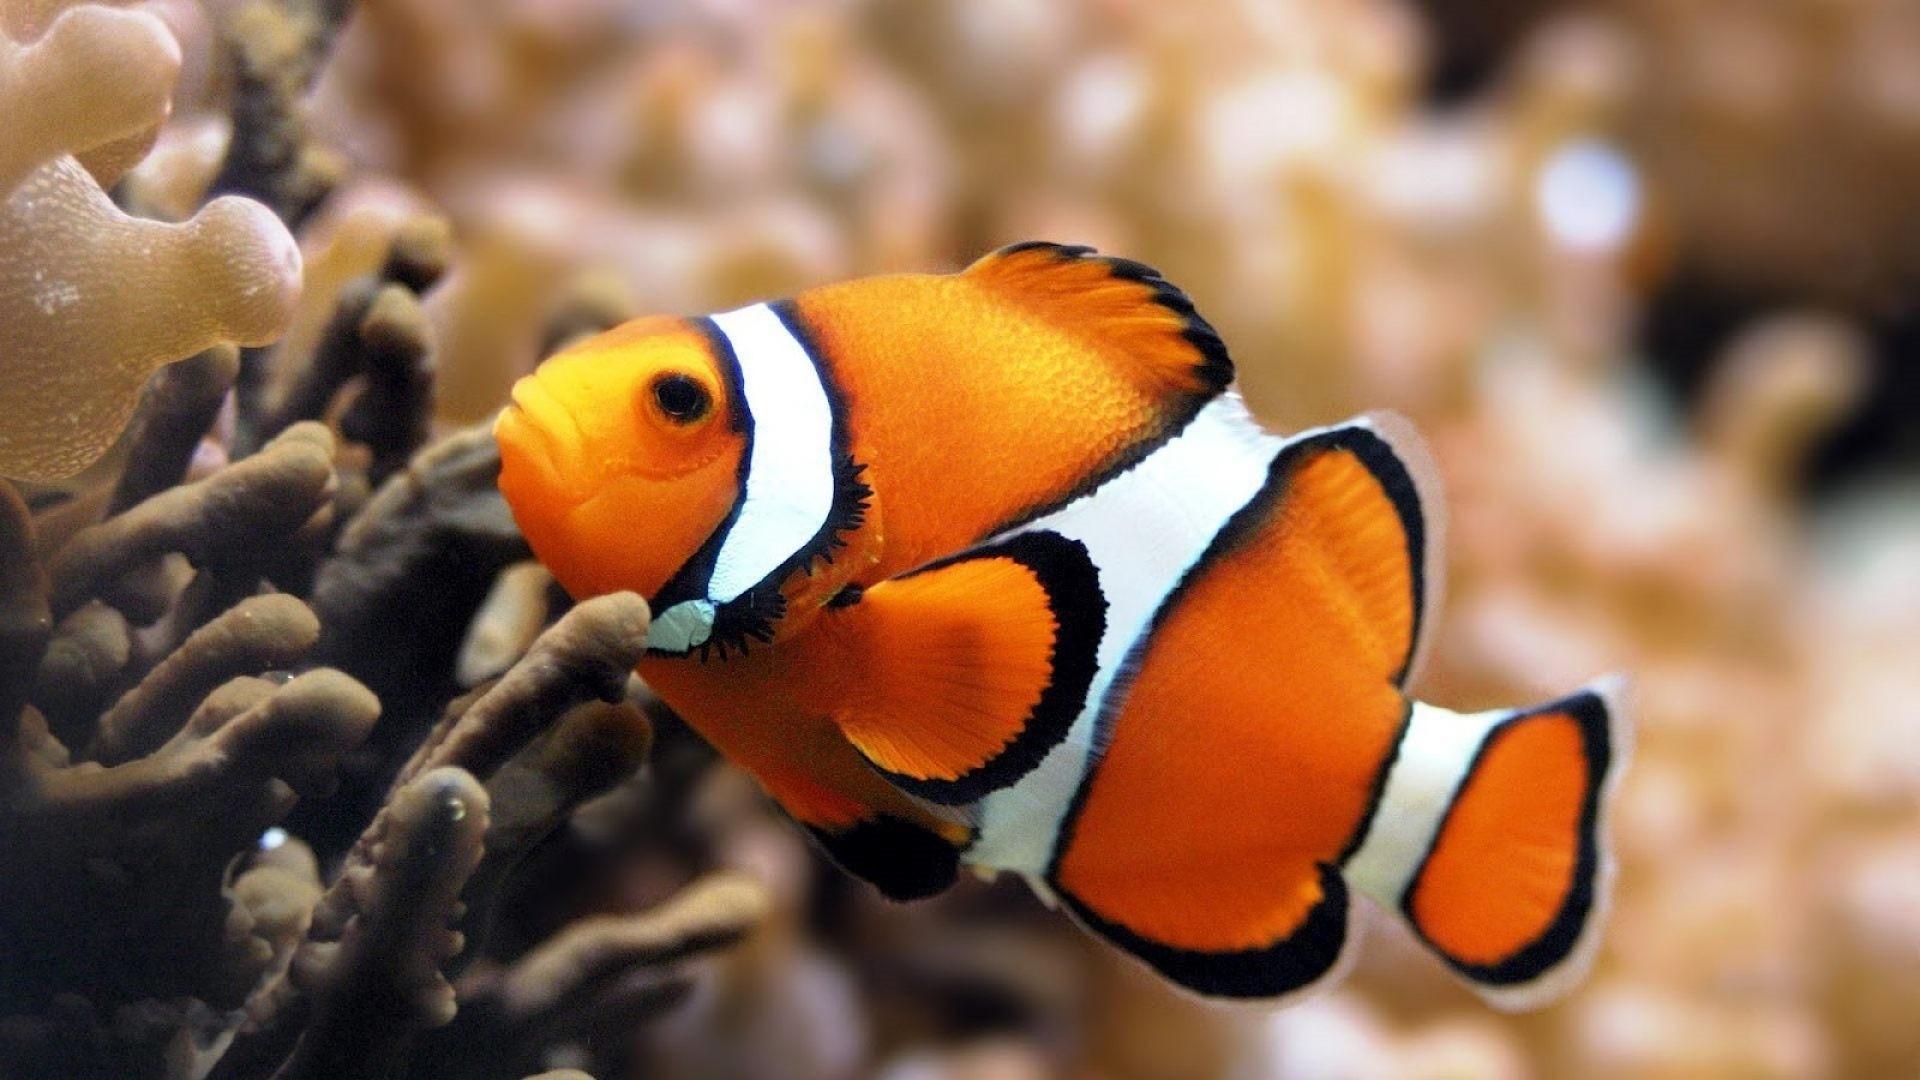 Fish HD Wallpaper